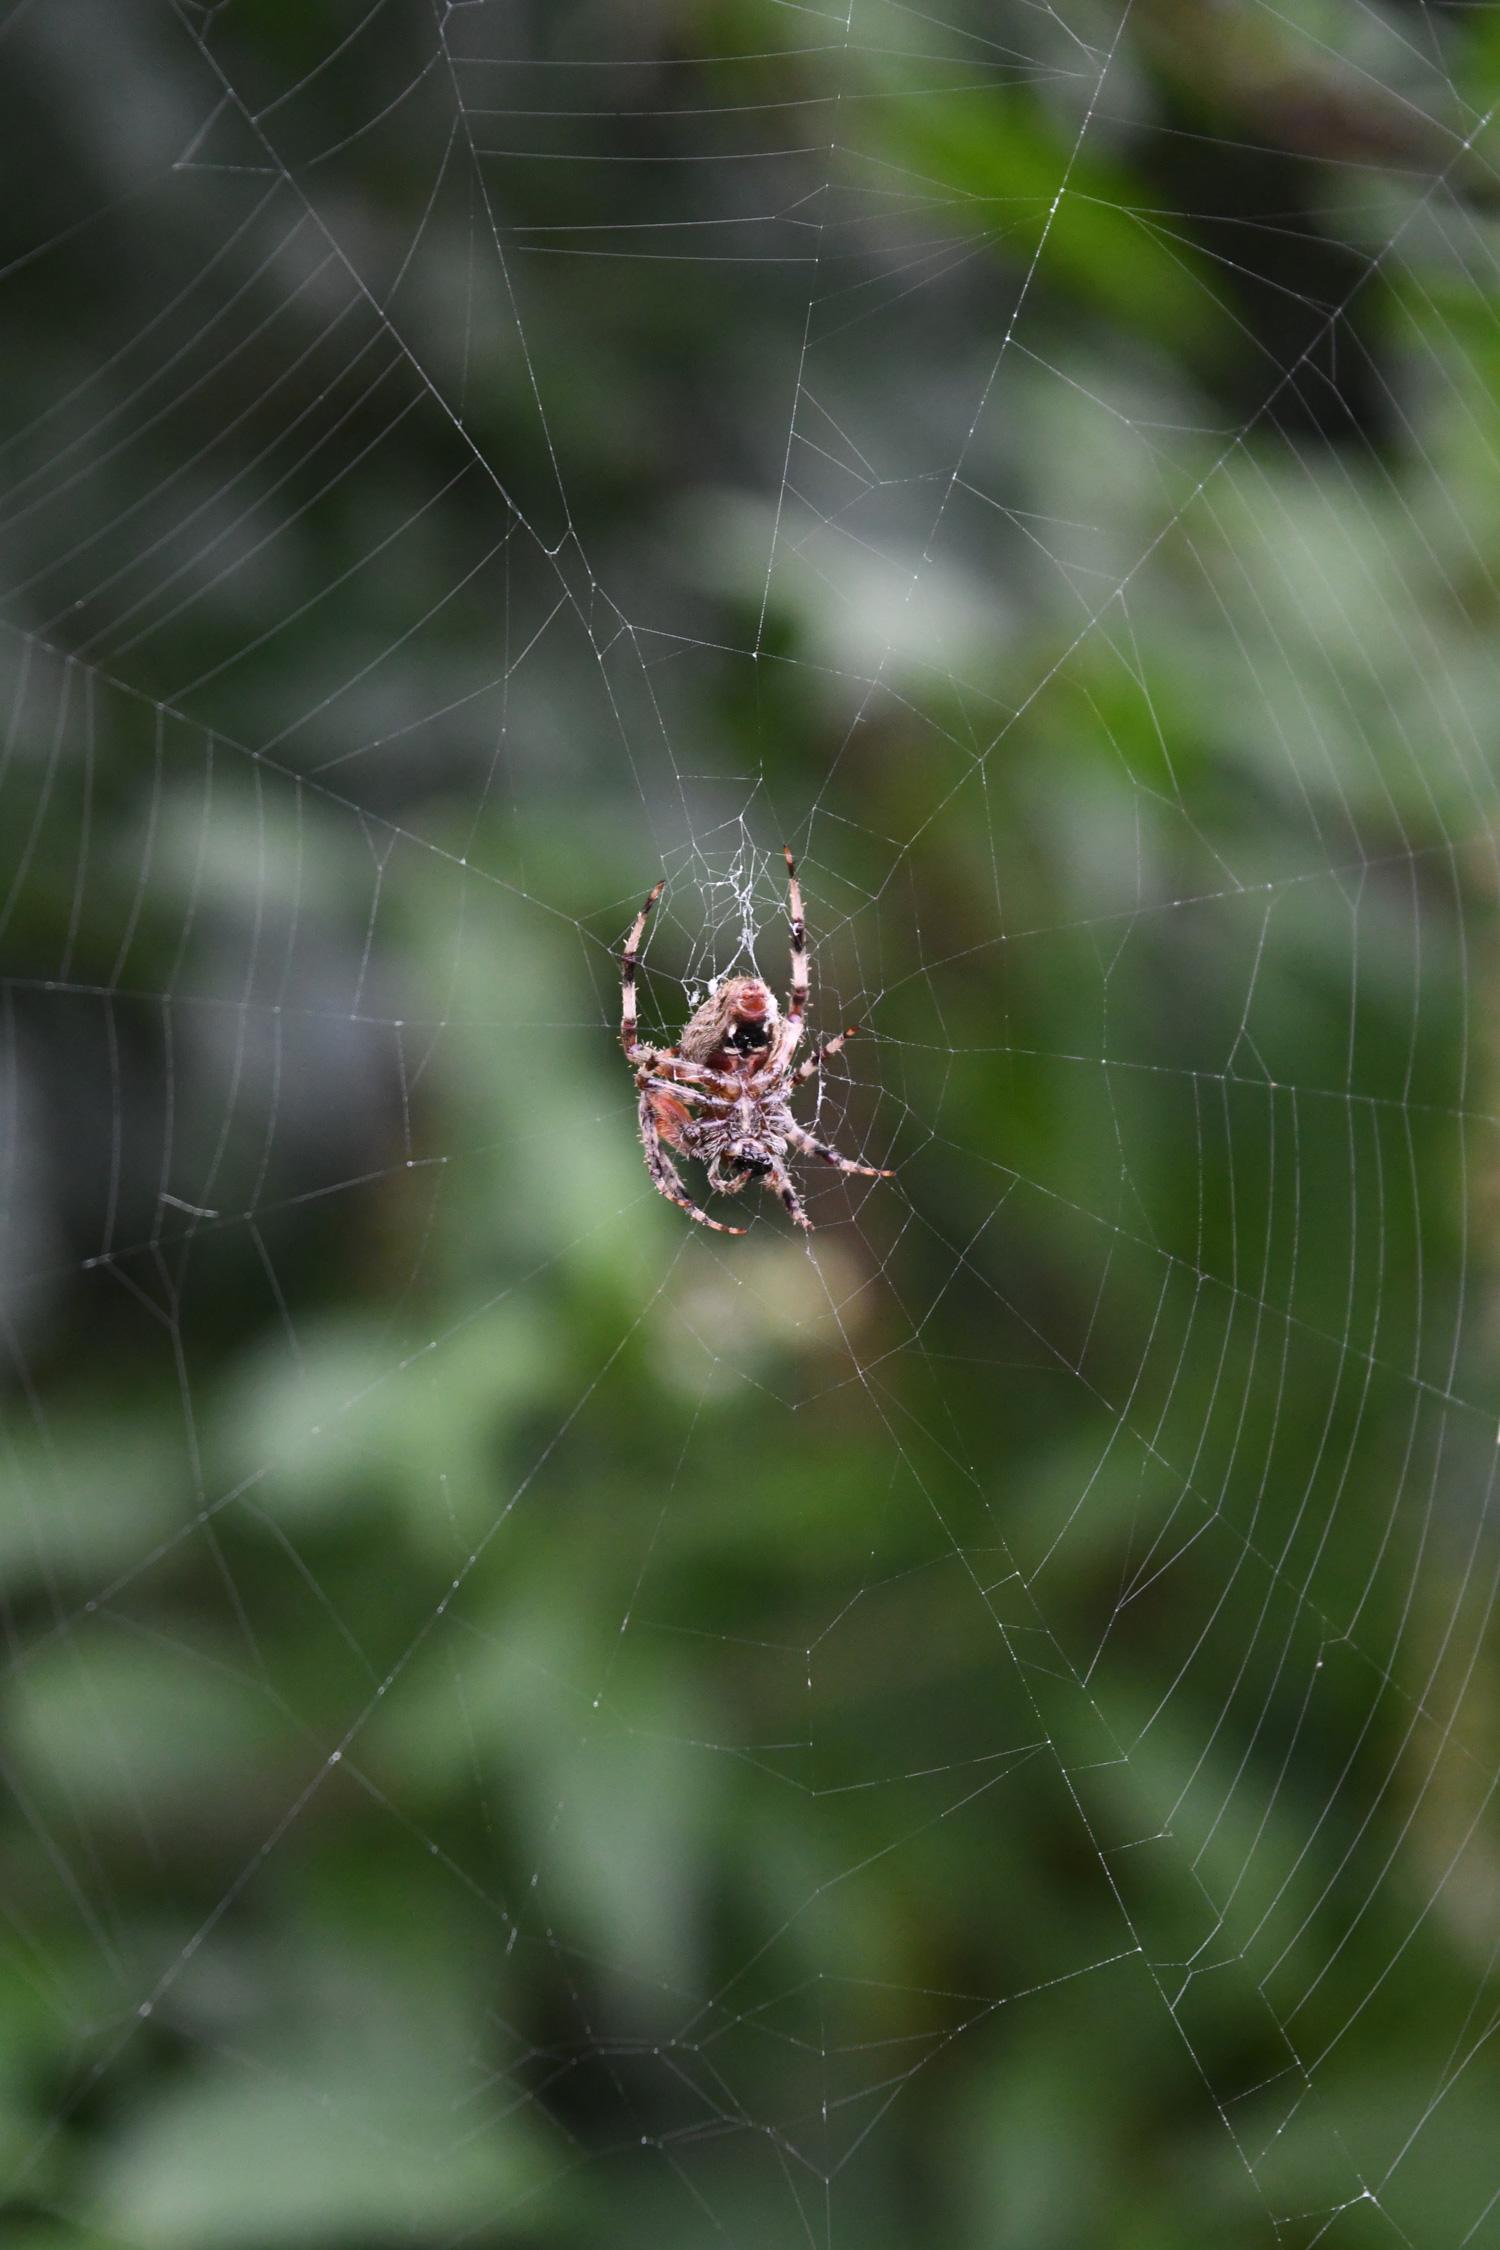 Spider, Prospect Park